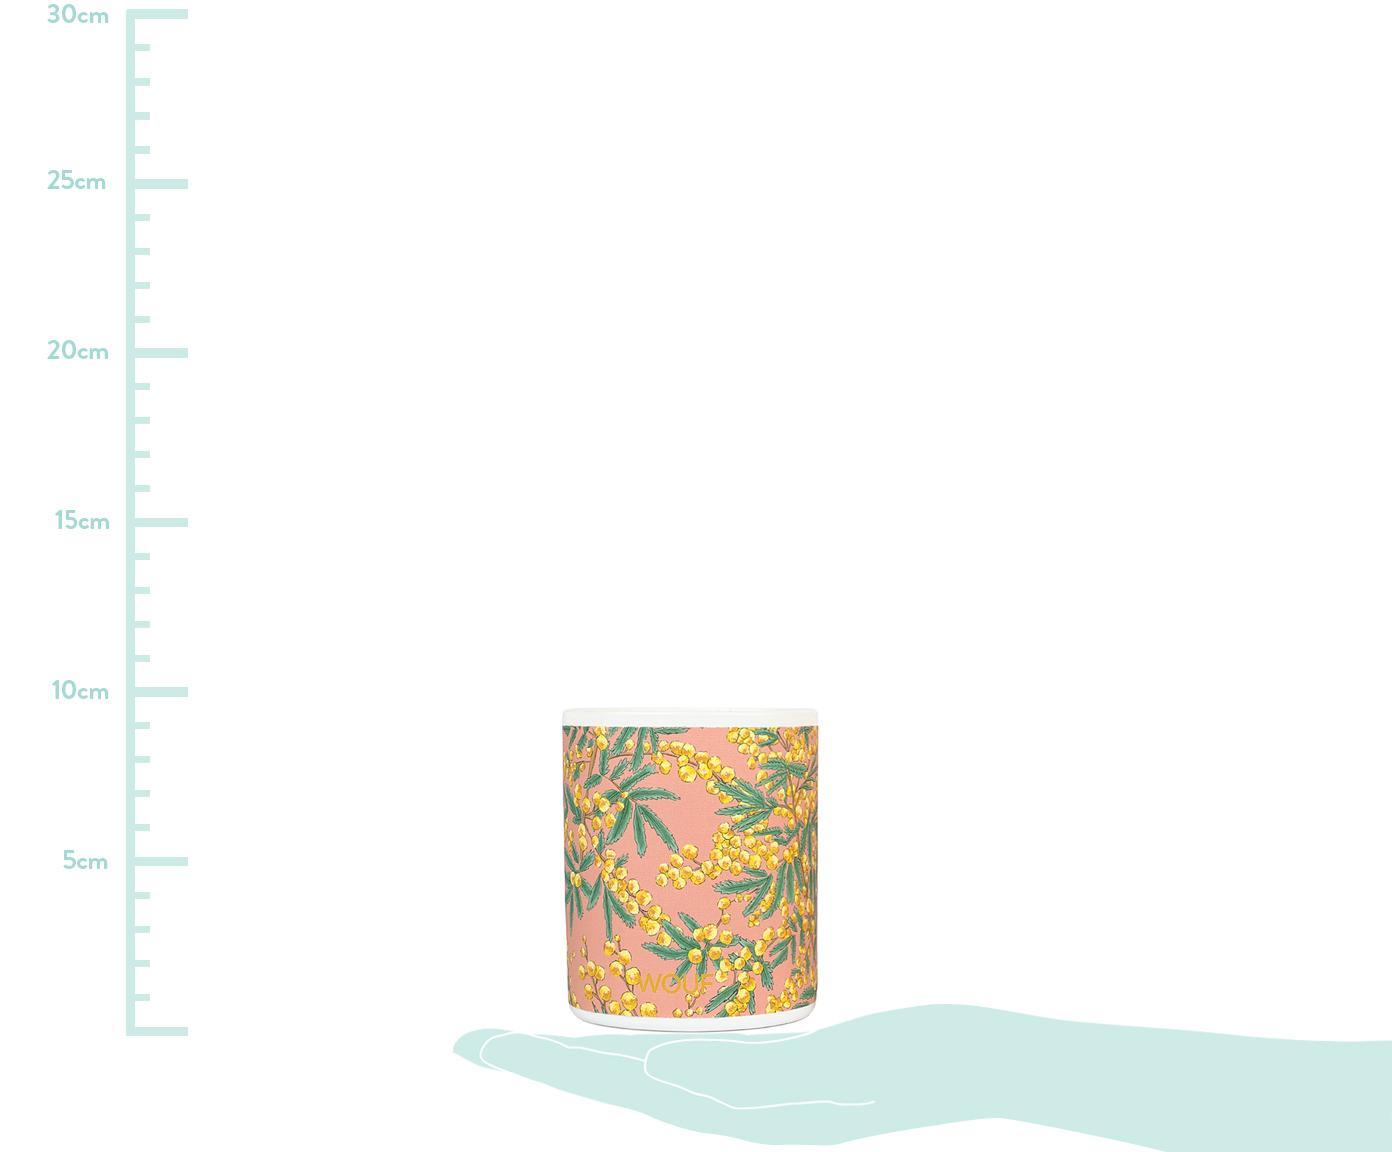 Vegane Duftkerze Mimosa (Mimose), Behälter: Glas, Rosa, Ø 8 x H 10 cm